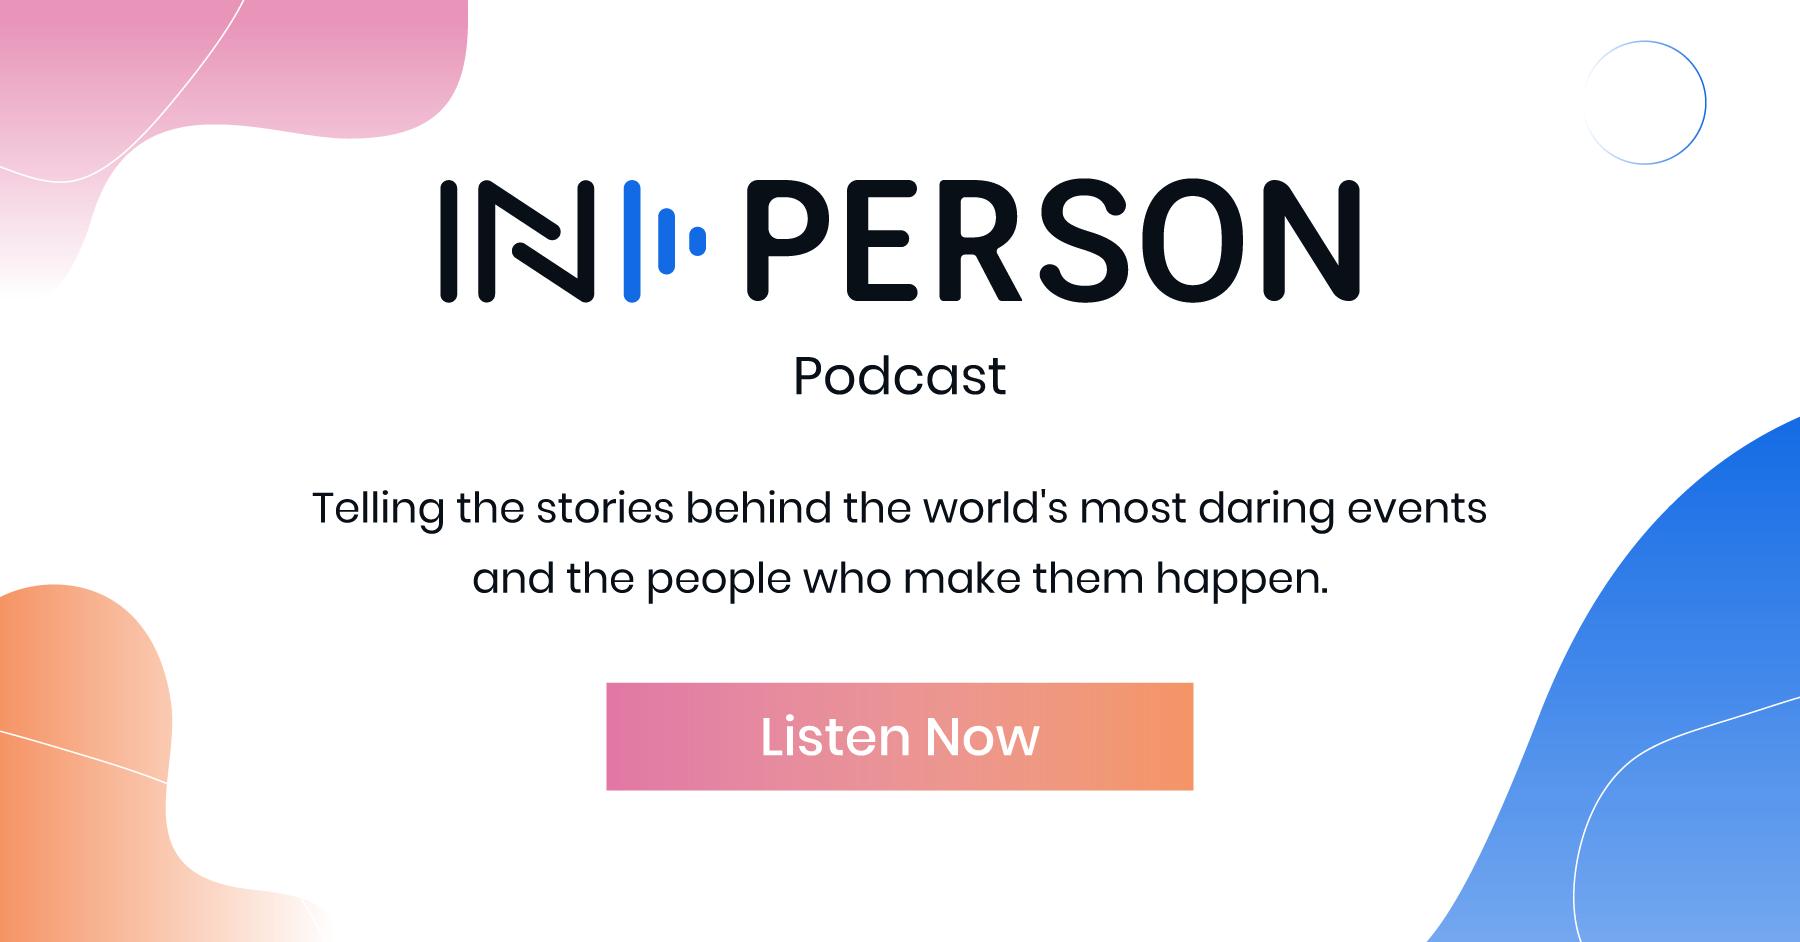 IN-PERSON Podcast